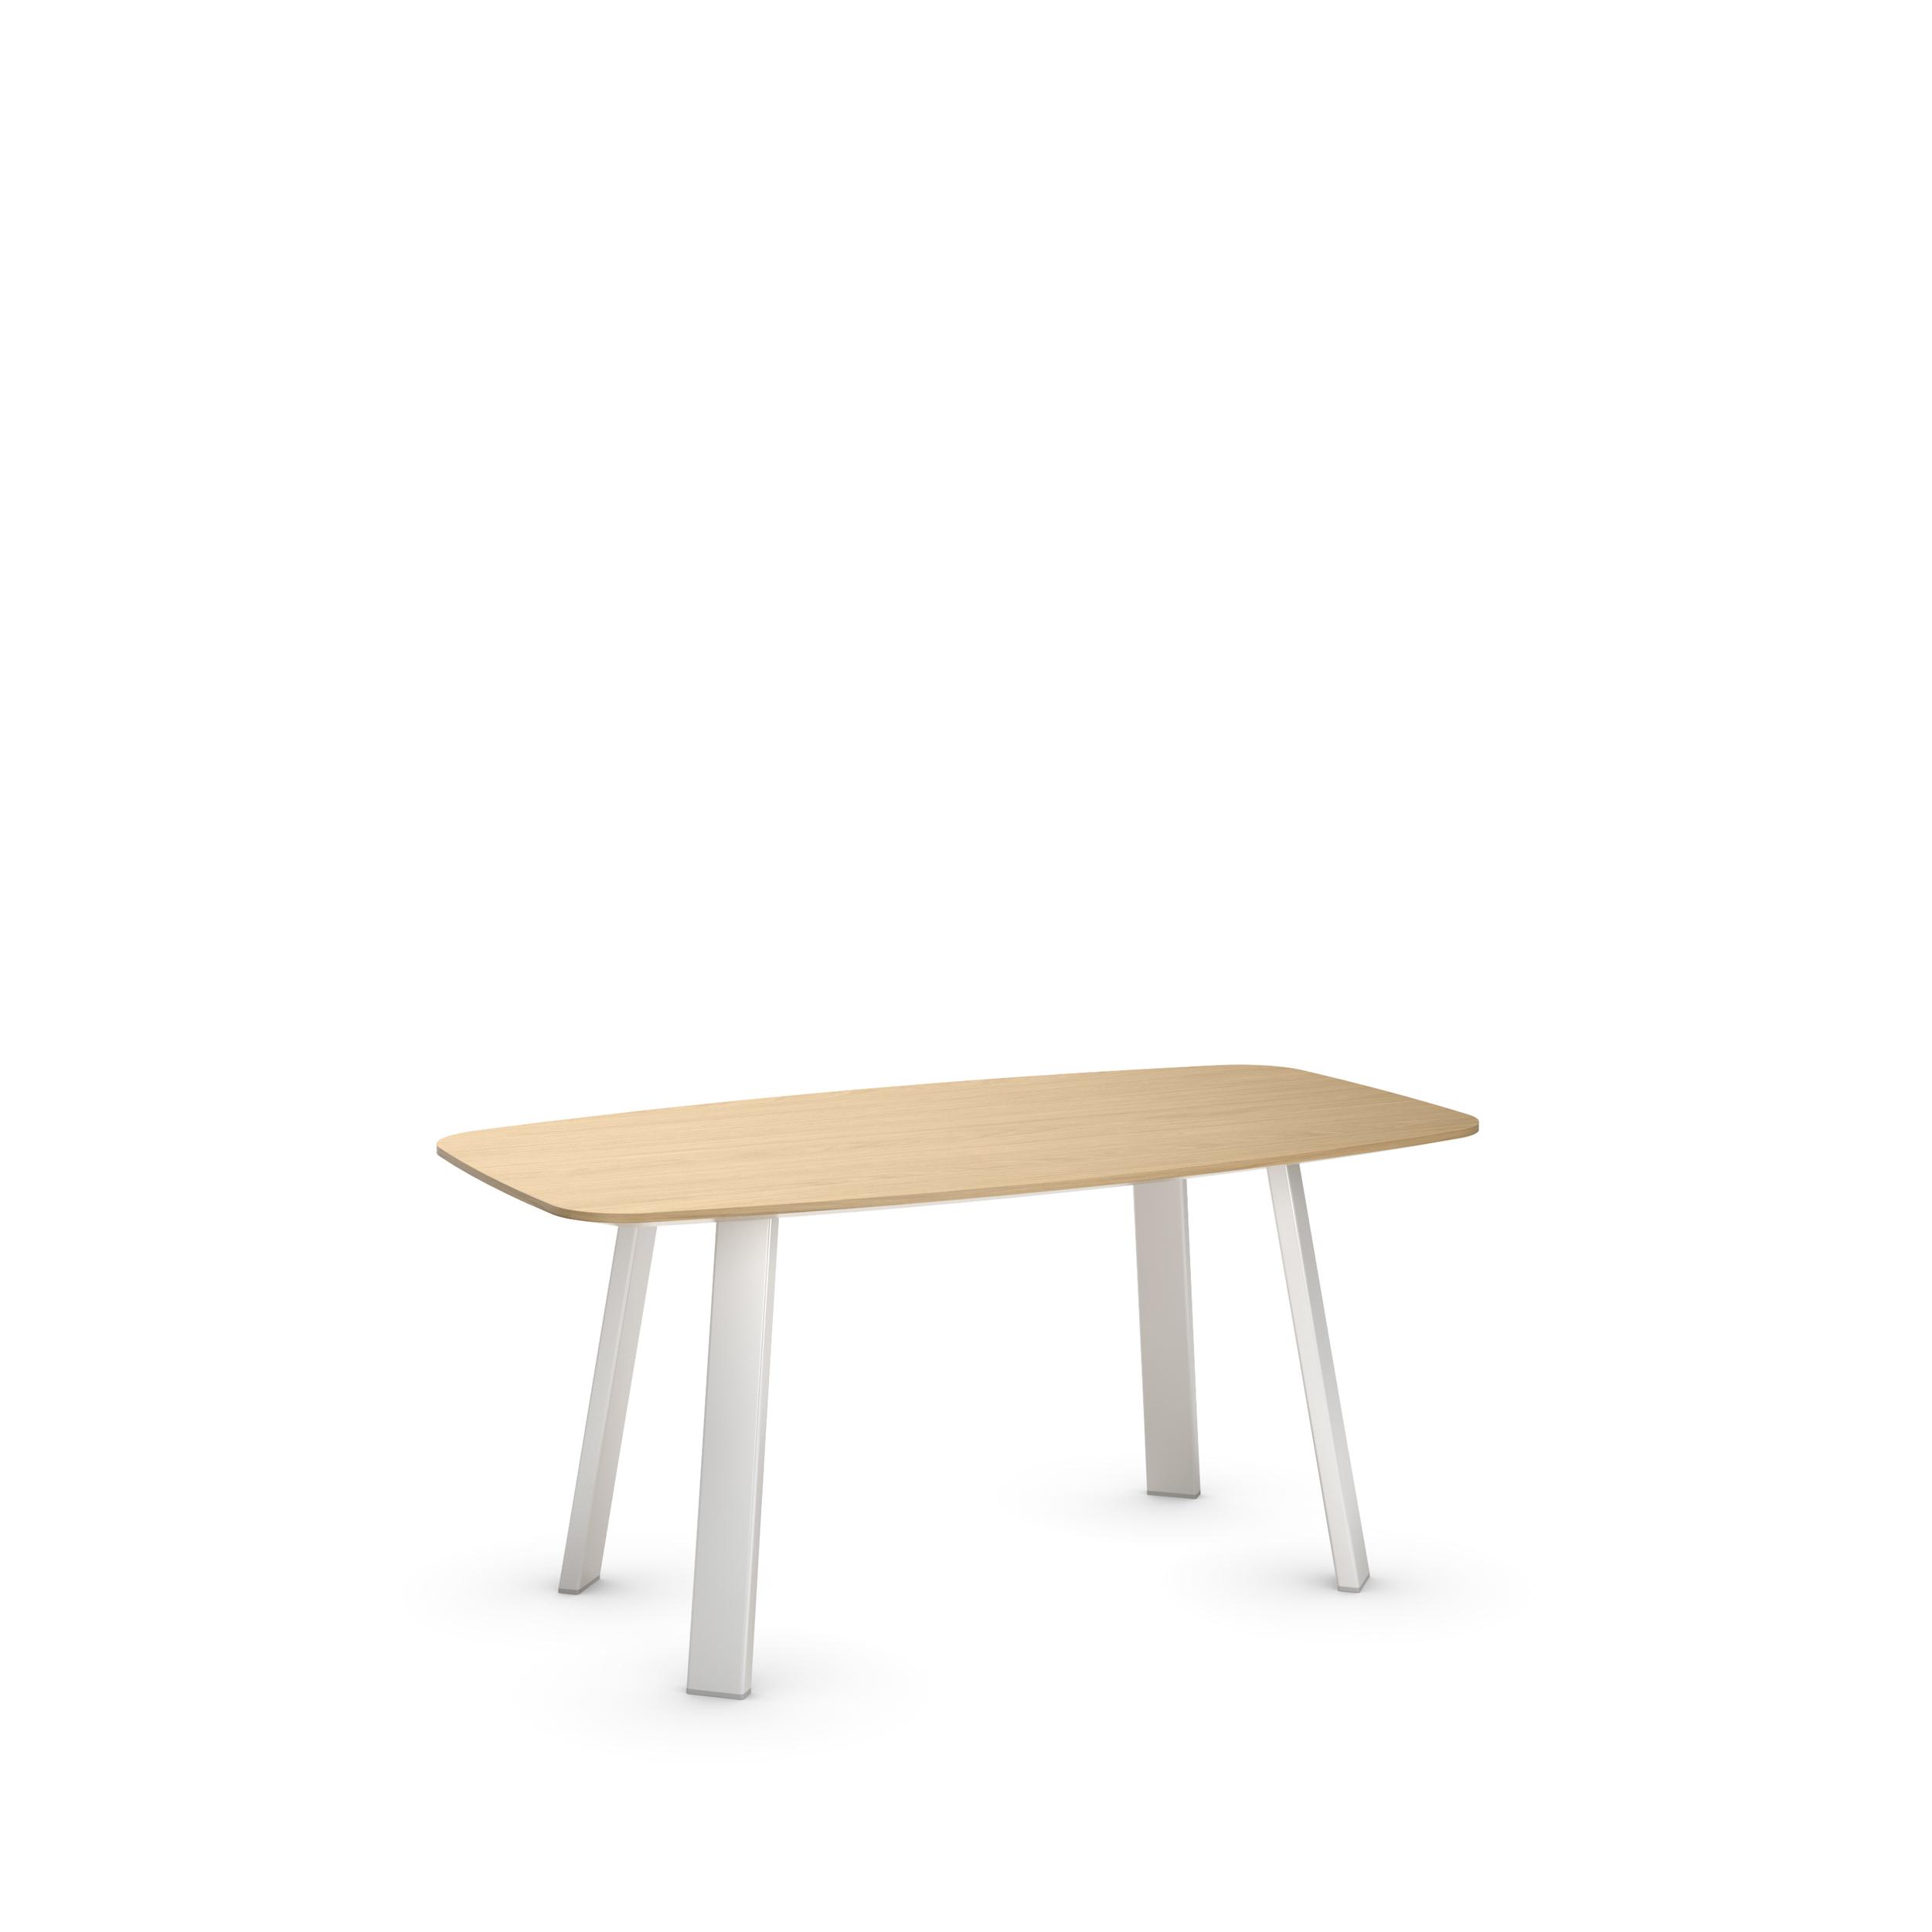 Obling Occasional Table.jpg